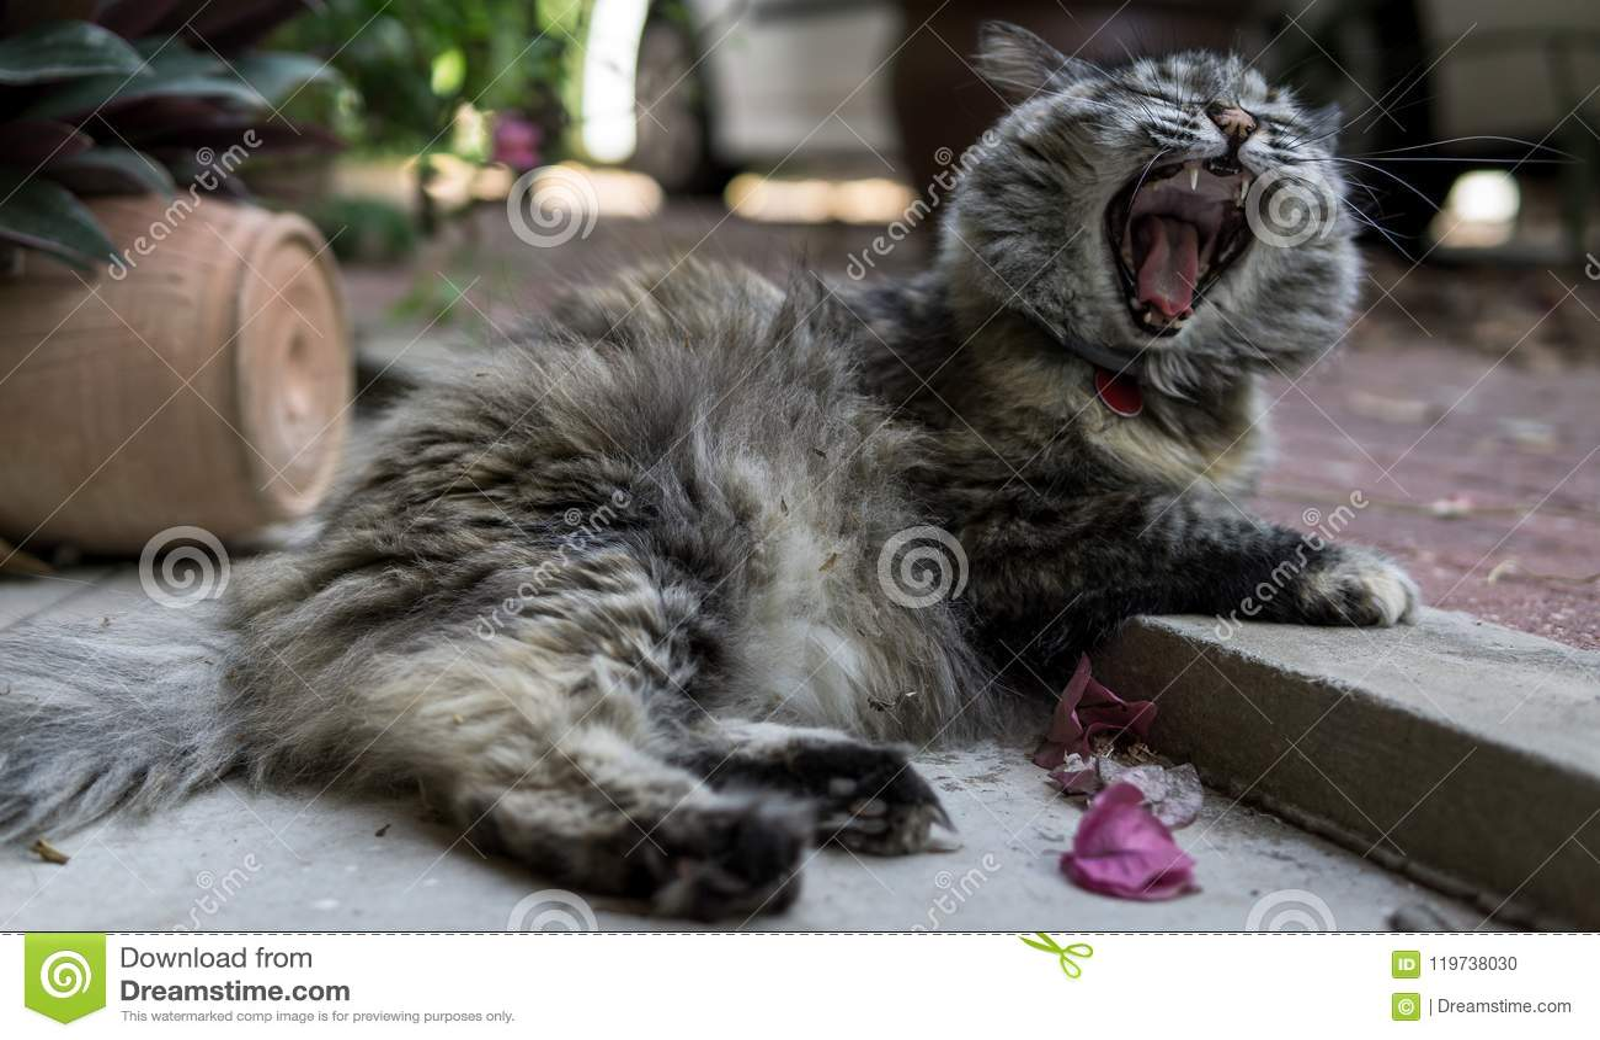 Perisan-tricolor cat yawning